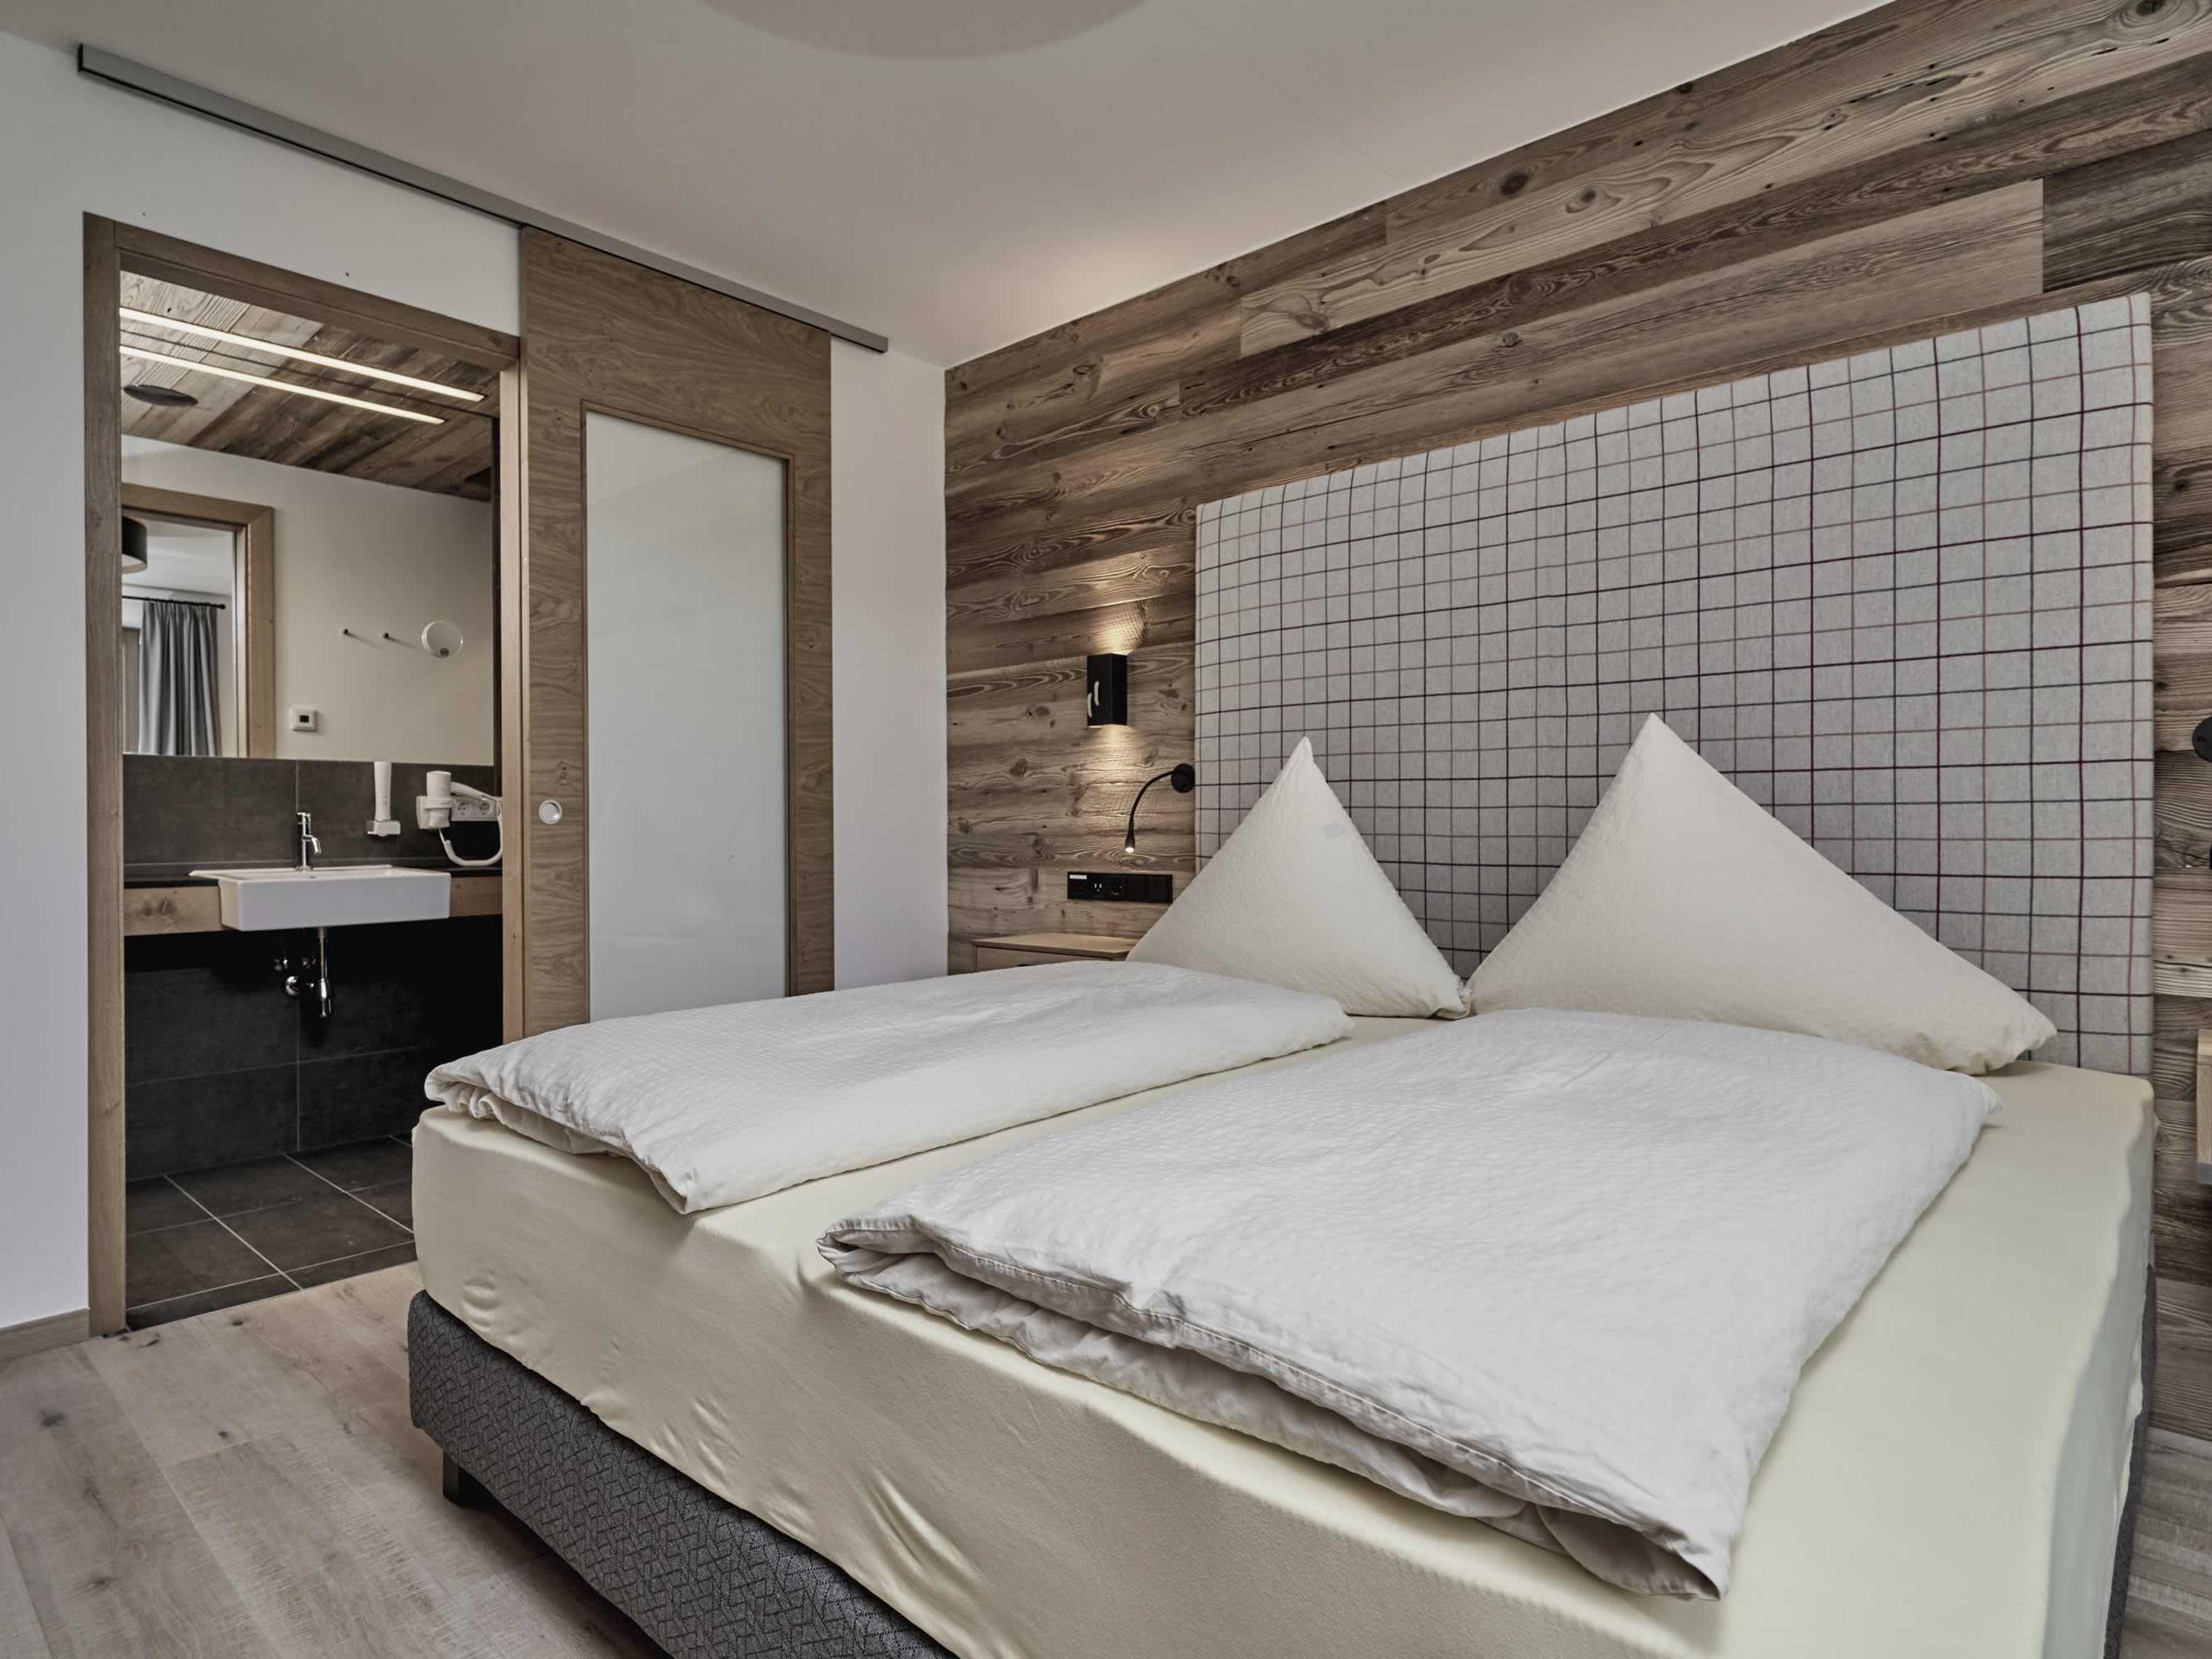 chalet-appartement-the-peak-jagd-chalet-5-personen